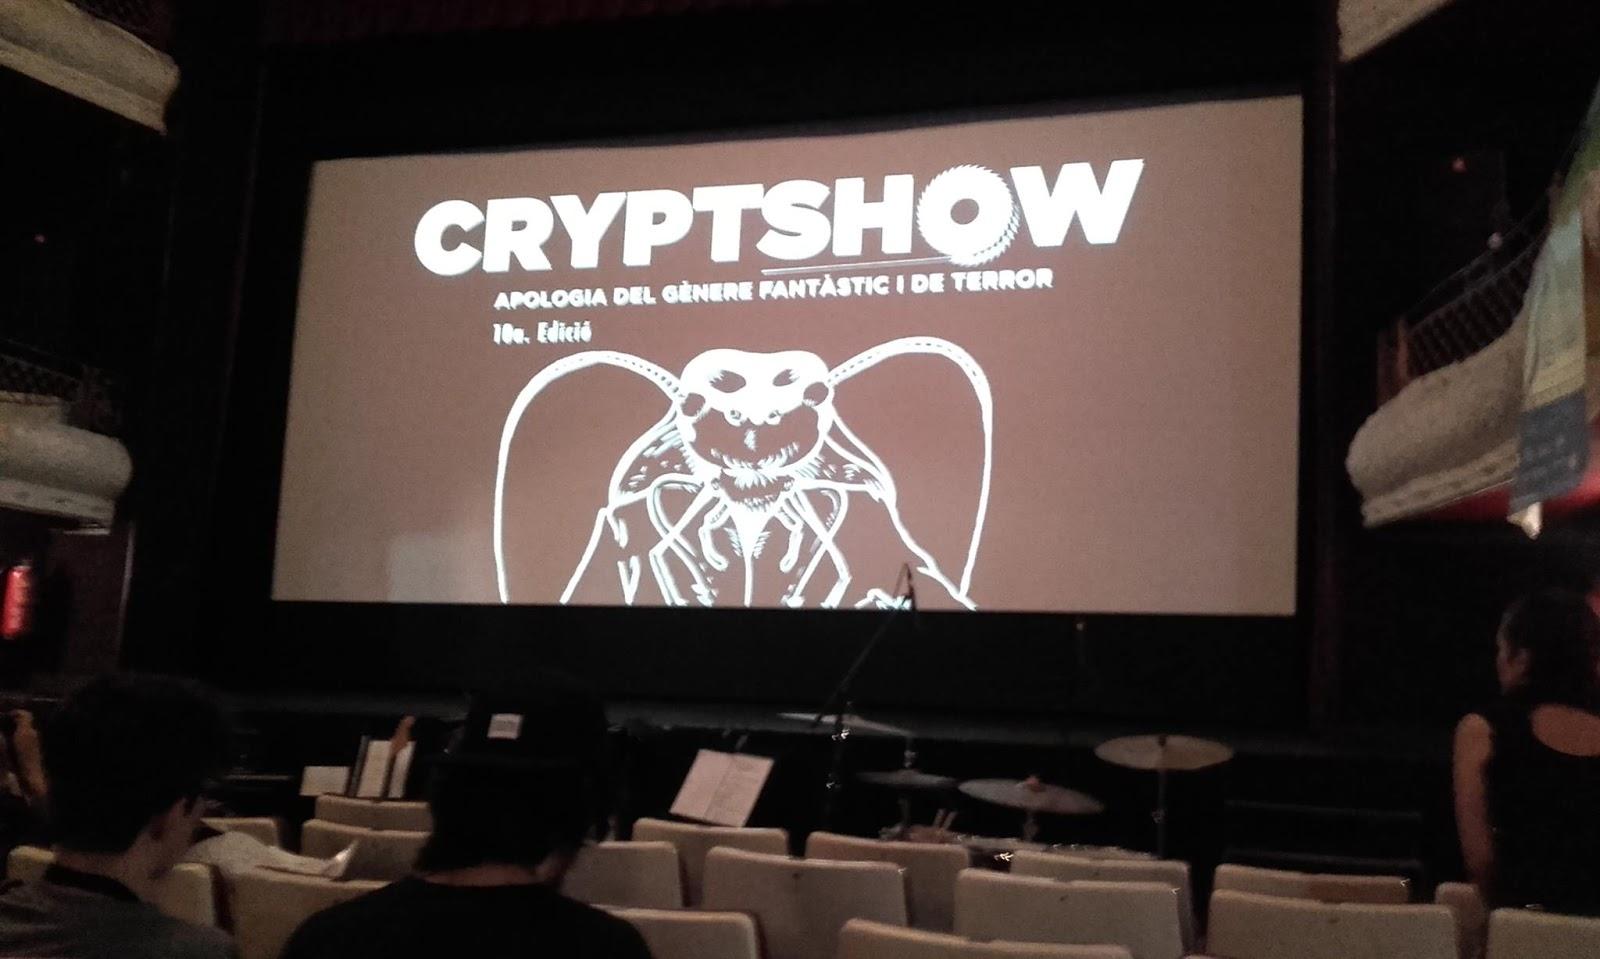 cryptshow festival badalona